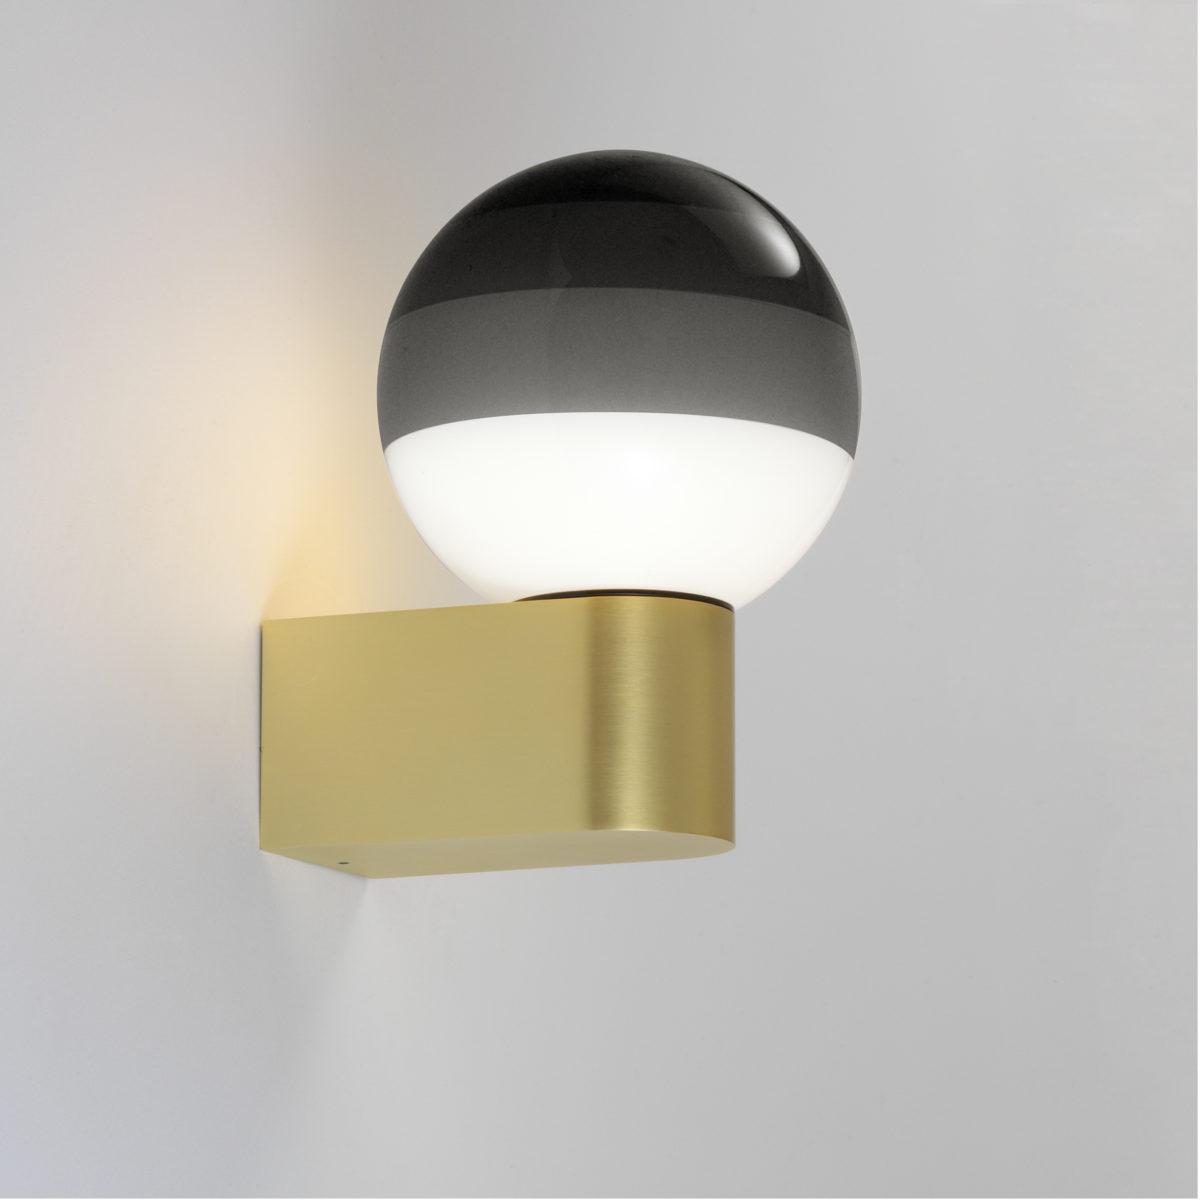 Wall Lamp - Dipping Light